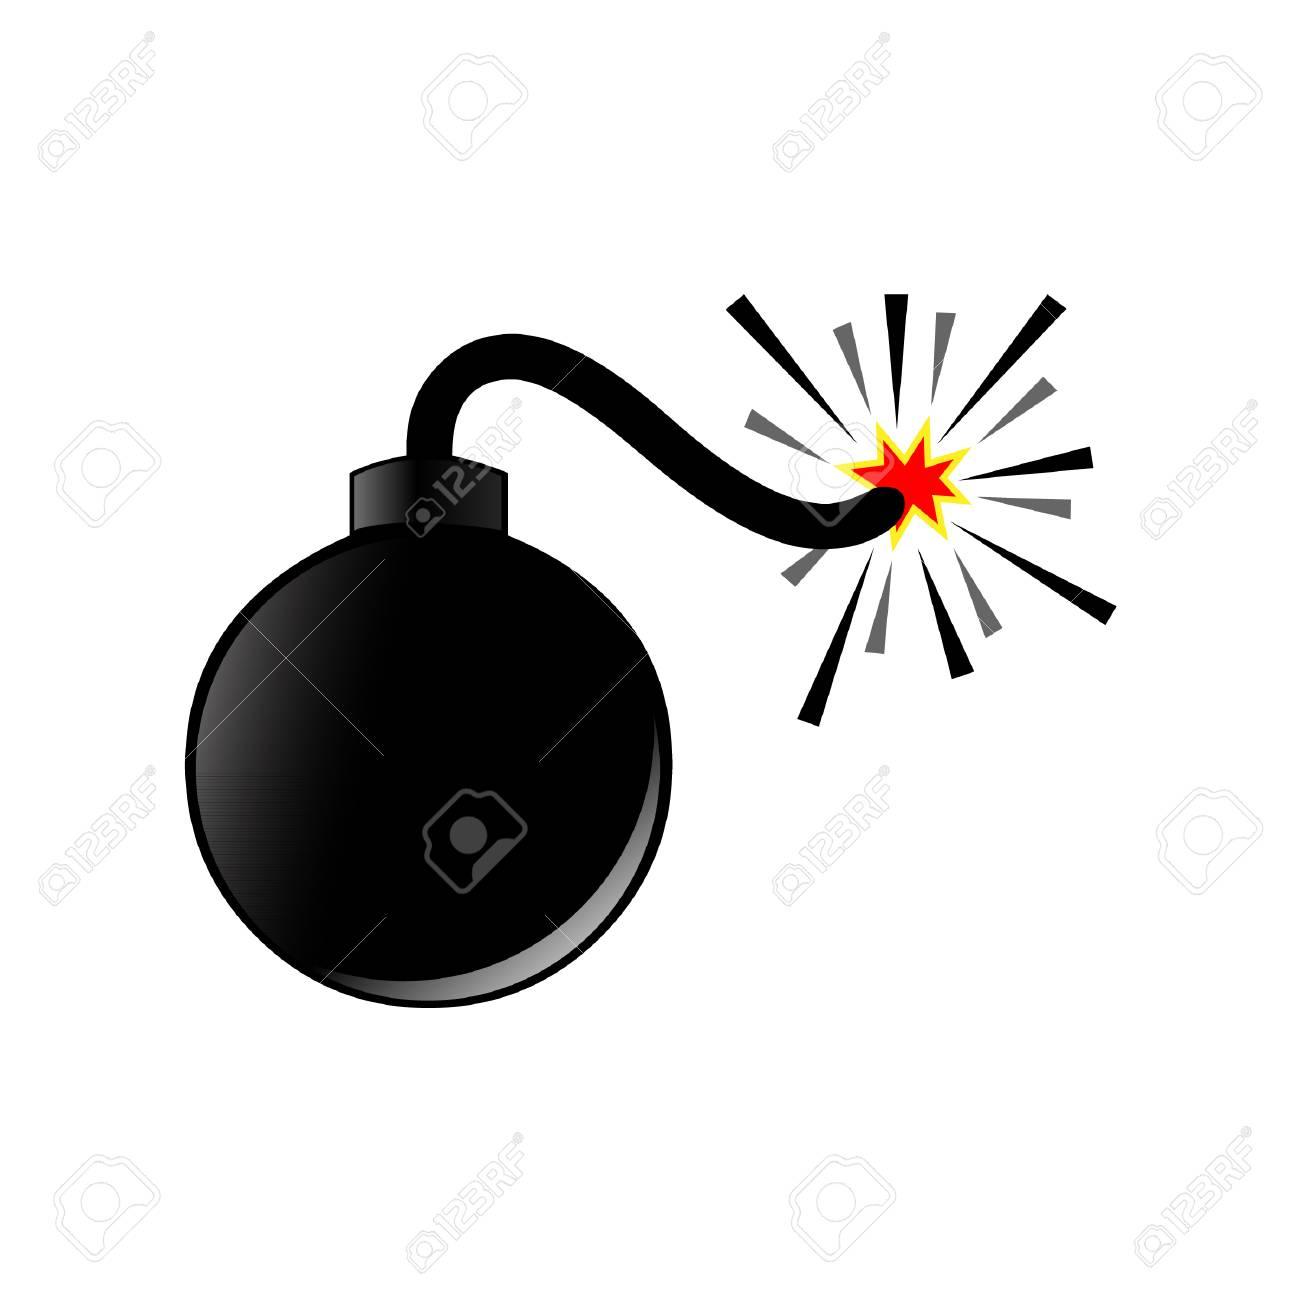 bomb vector royalty free cliparts vectors and stock illustration rh 123rf com bomb vector free bomb vector free